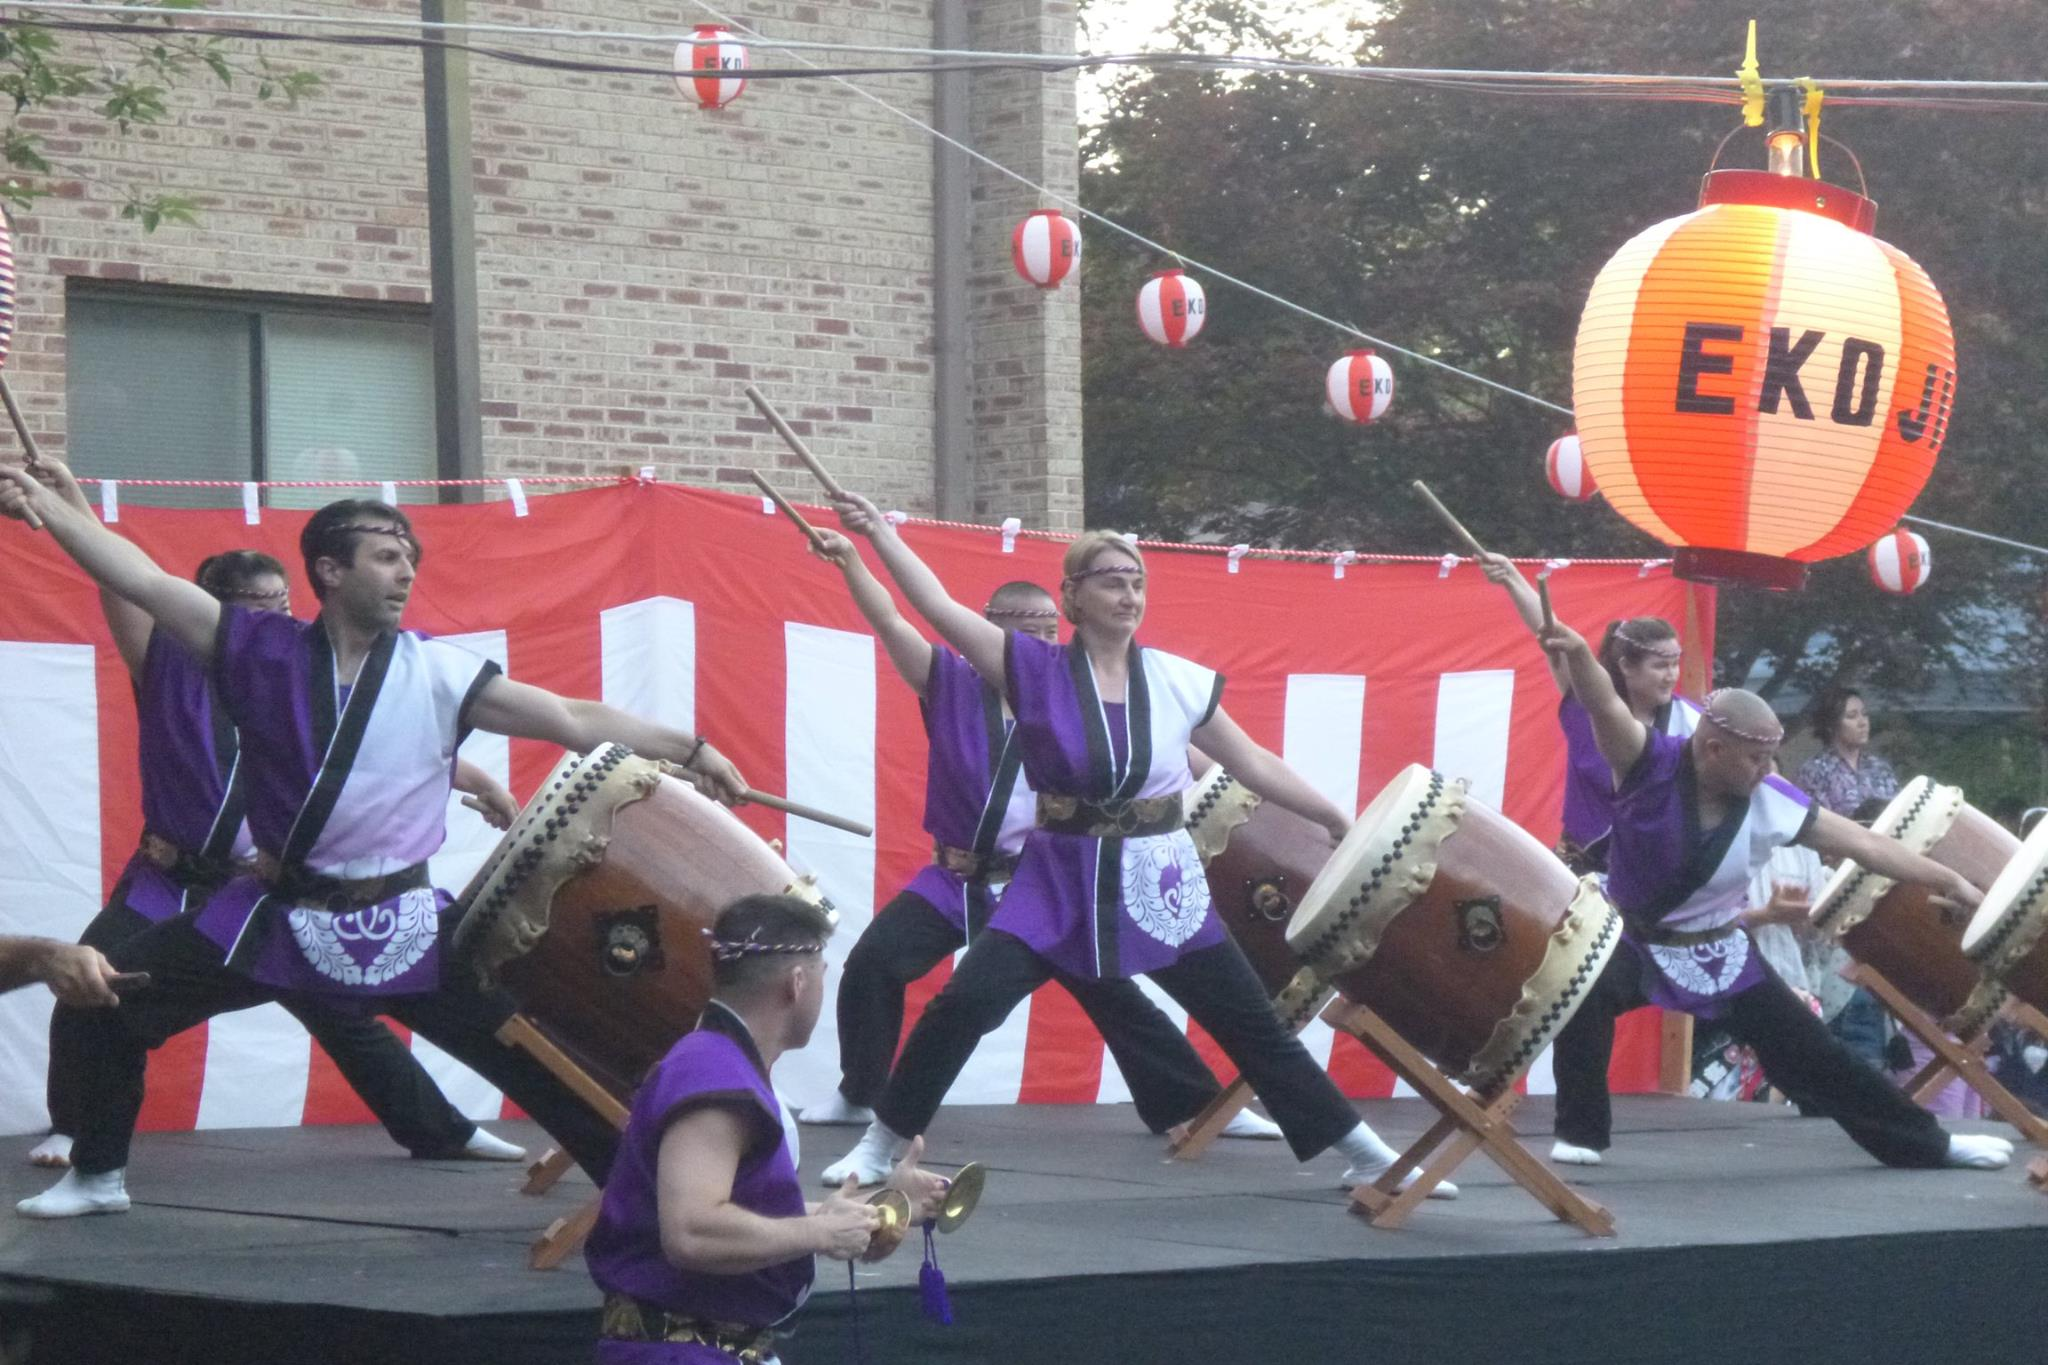 Nen Daiko playing Renshuu at the Obon Festival, July 2015